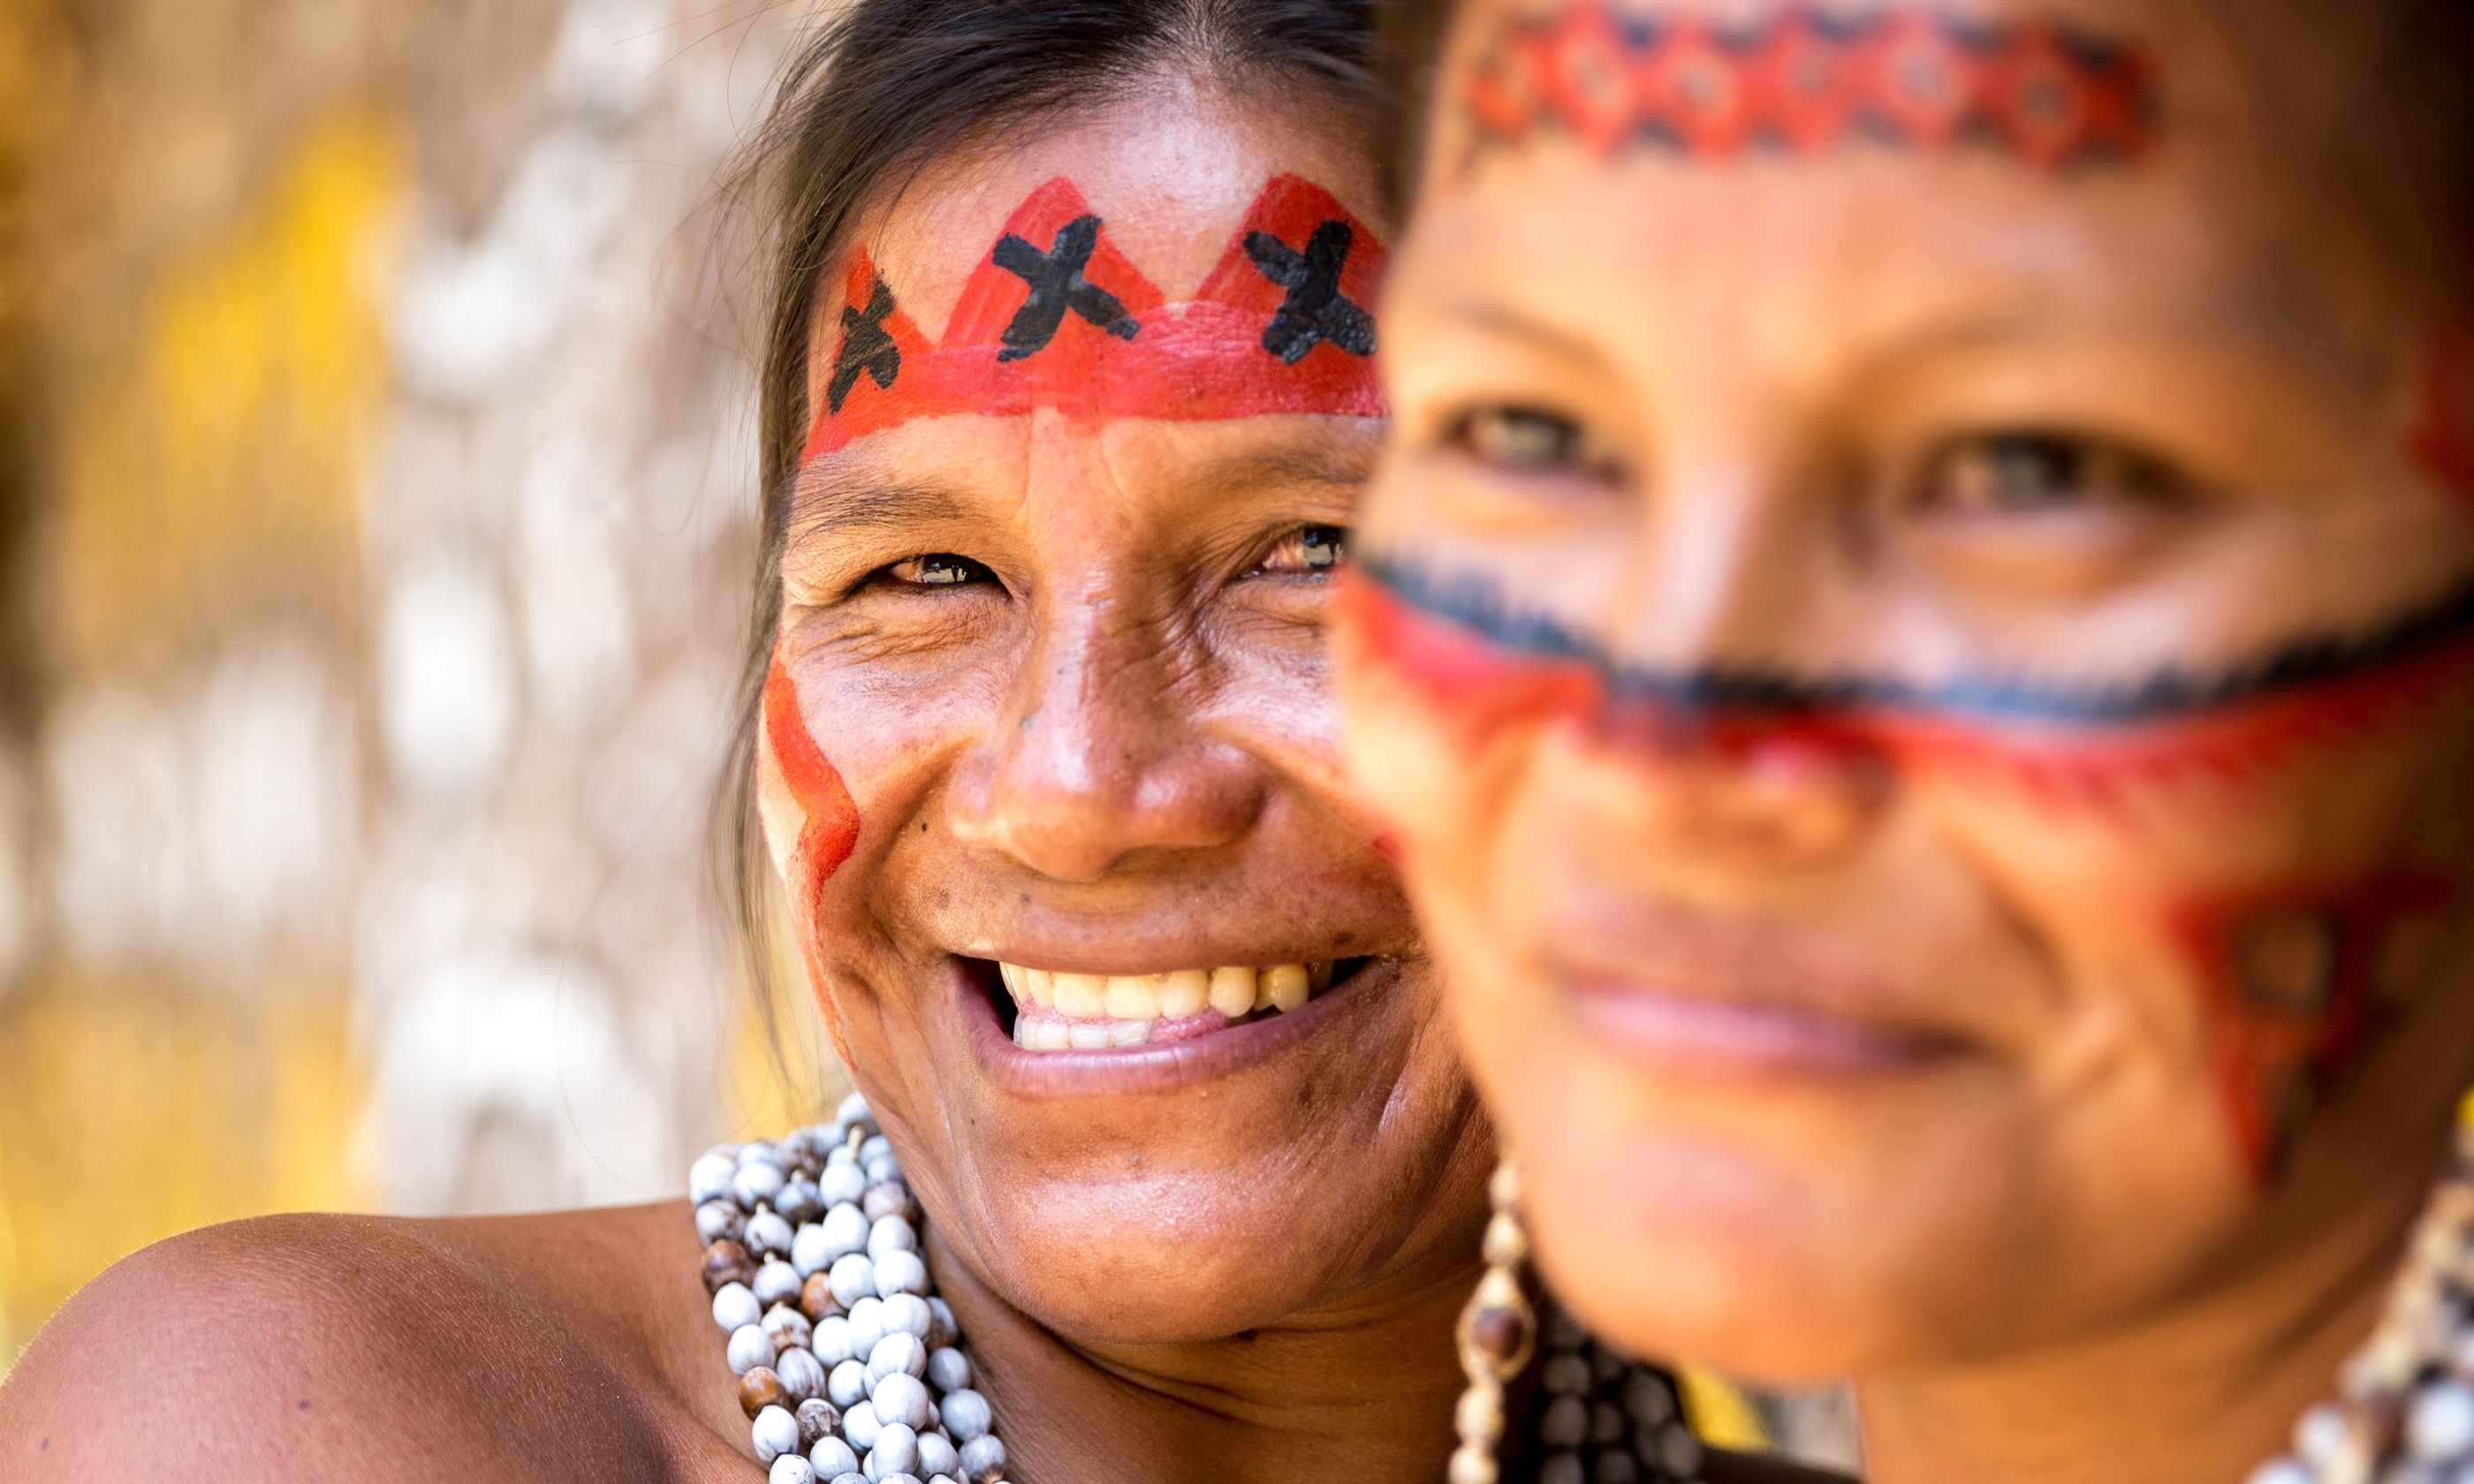 Indigenous tribe, Brazil (Shutterstock.com)